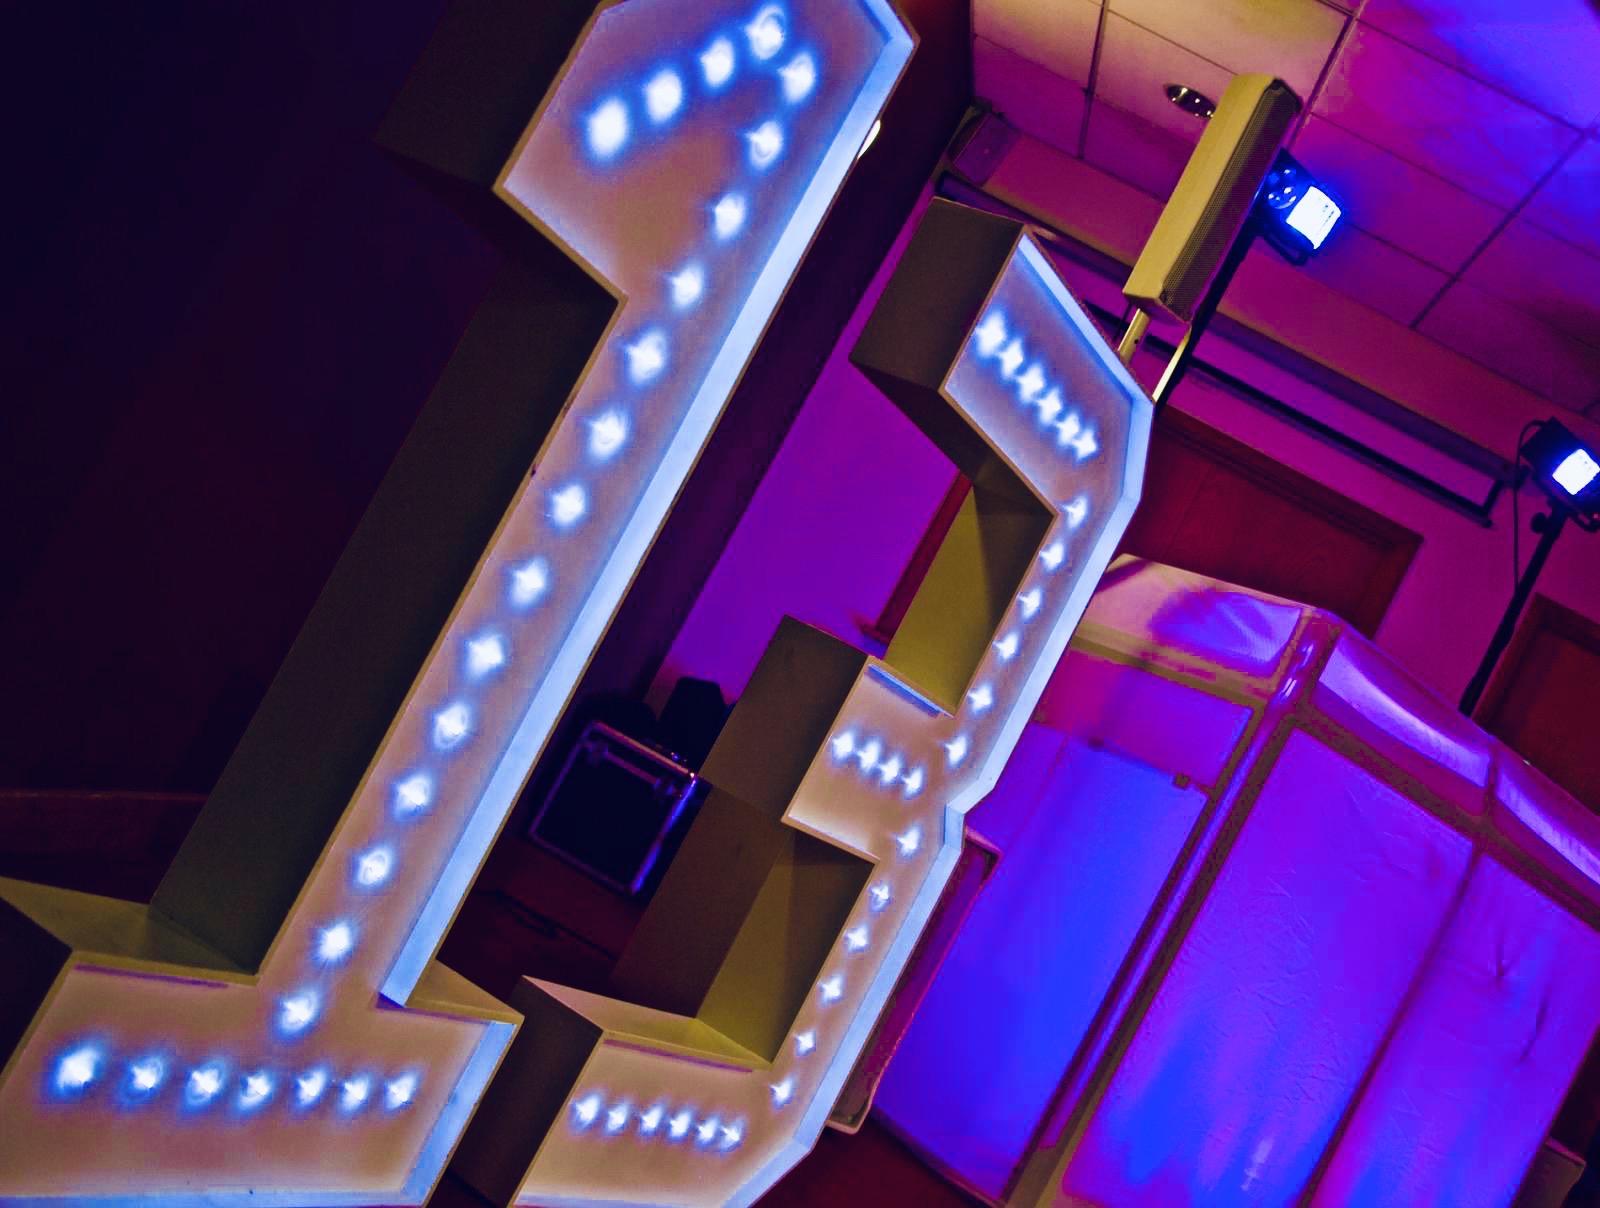 Light up numbers for teen discos in Essex DJs for teenage discos in Essex - Moji Entertainer